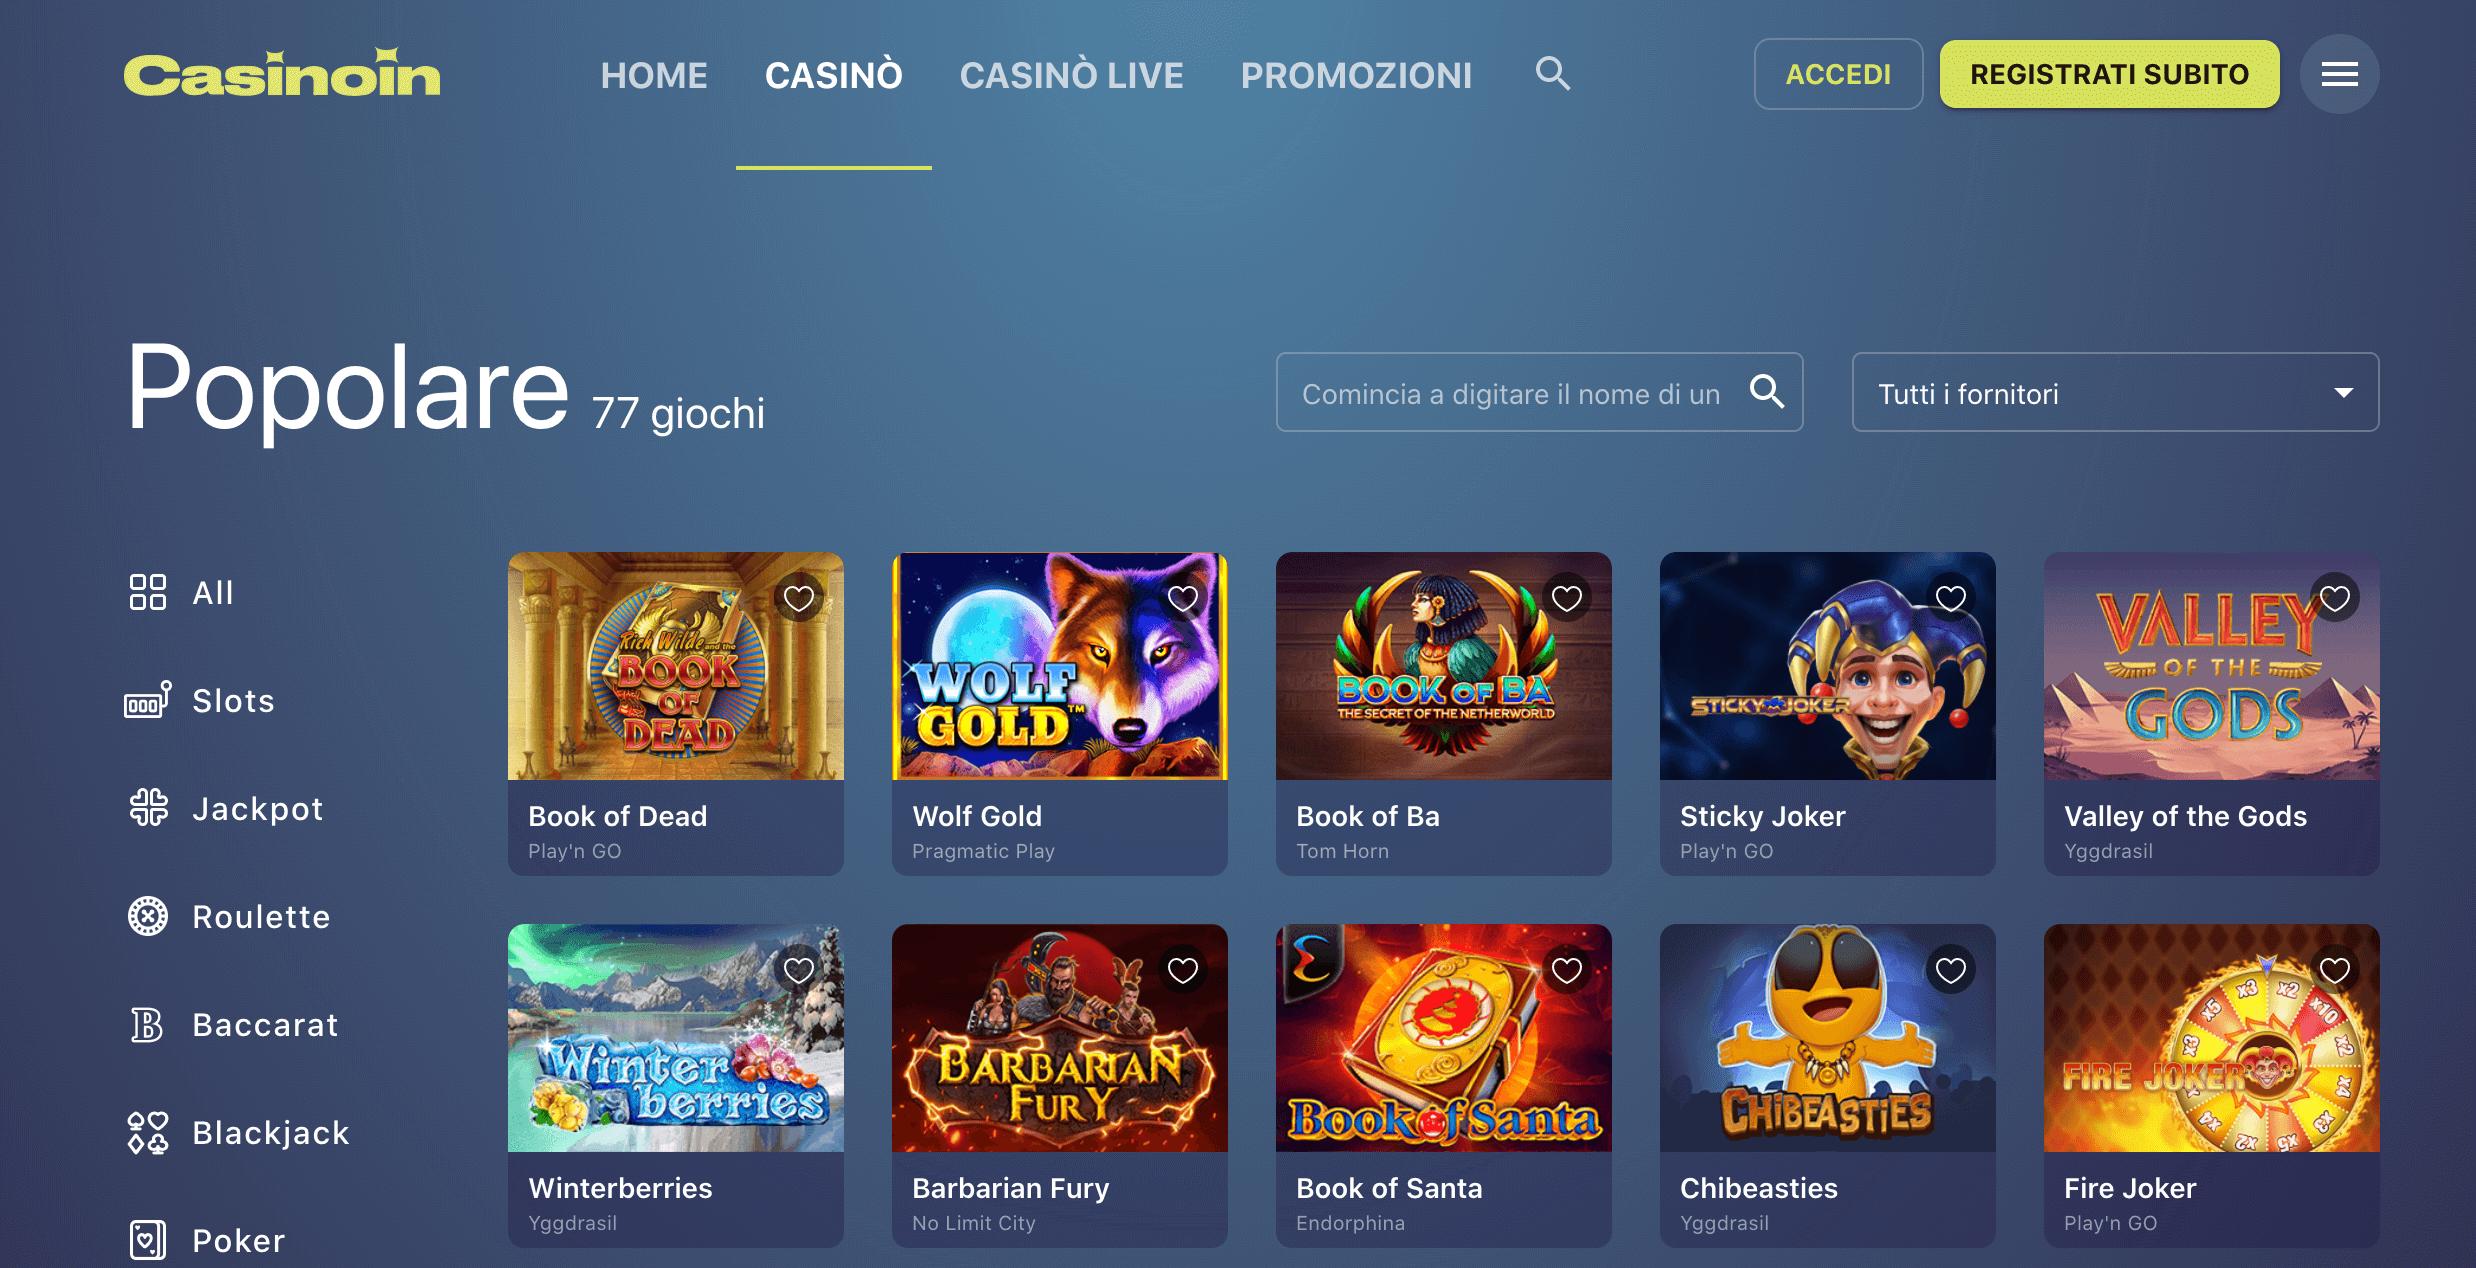 Slot CasinoIn